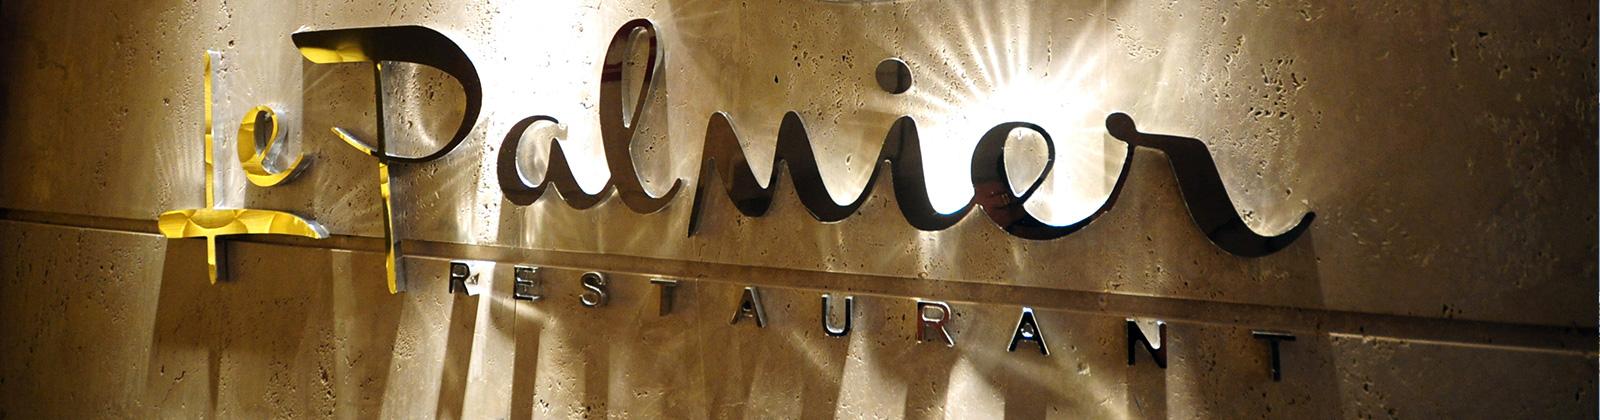 Restaurante Le Palmier - Vila Ema